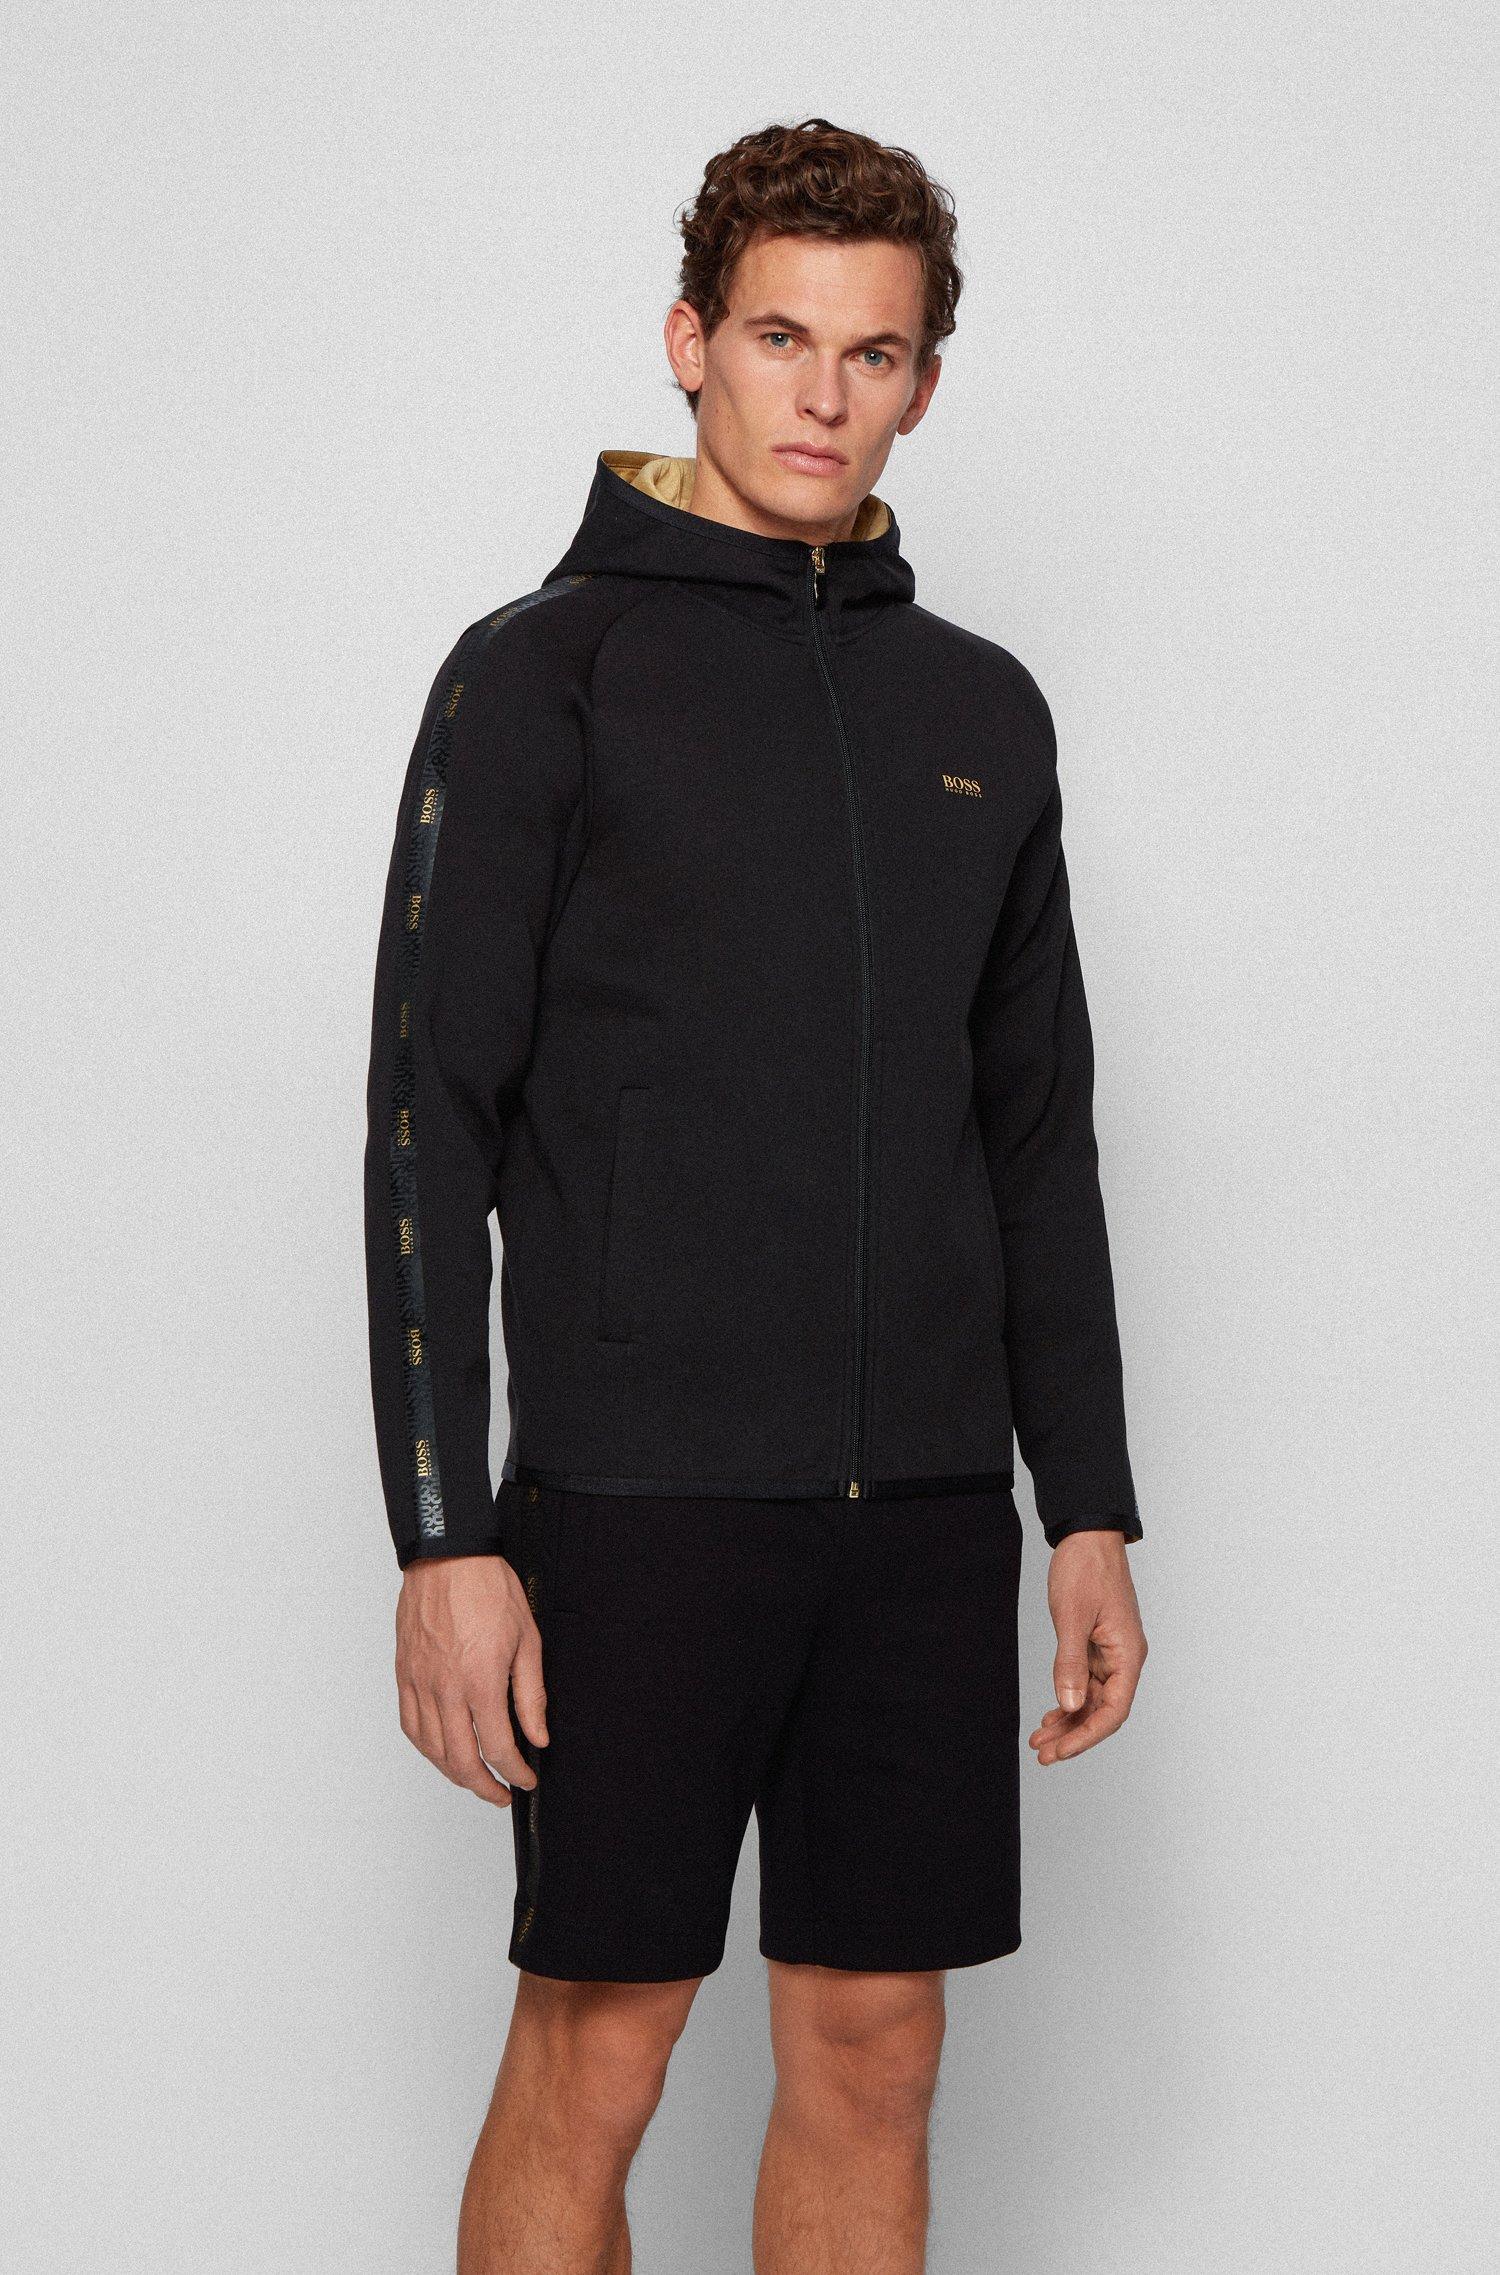 Interlock-fabric hooded sweatshirt with logo-tape trim, Black